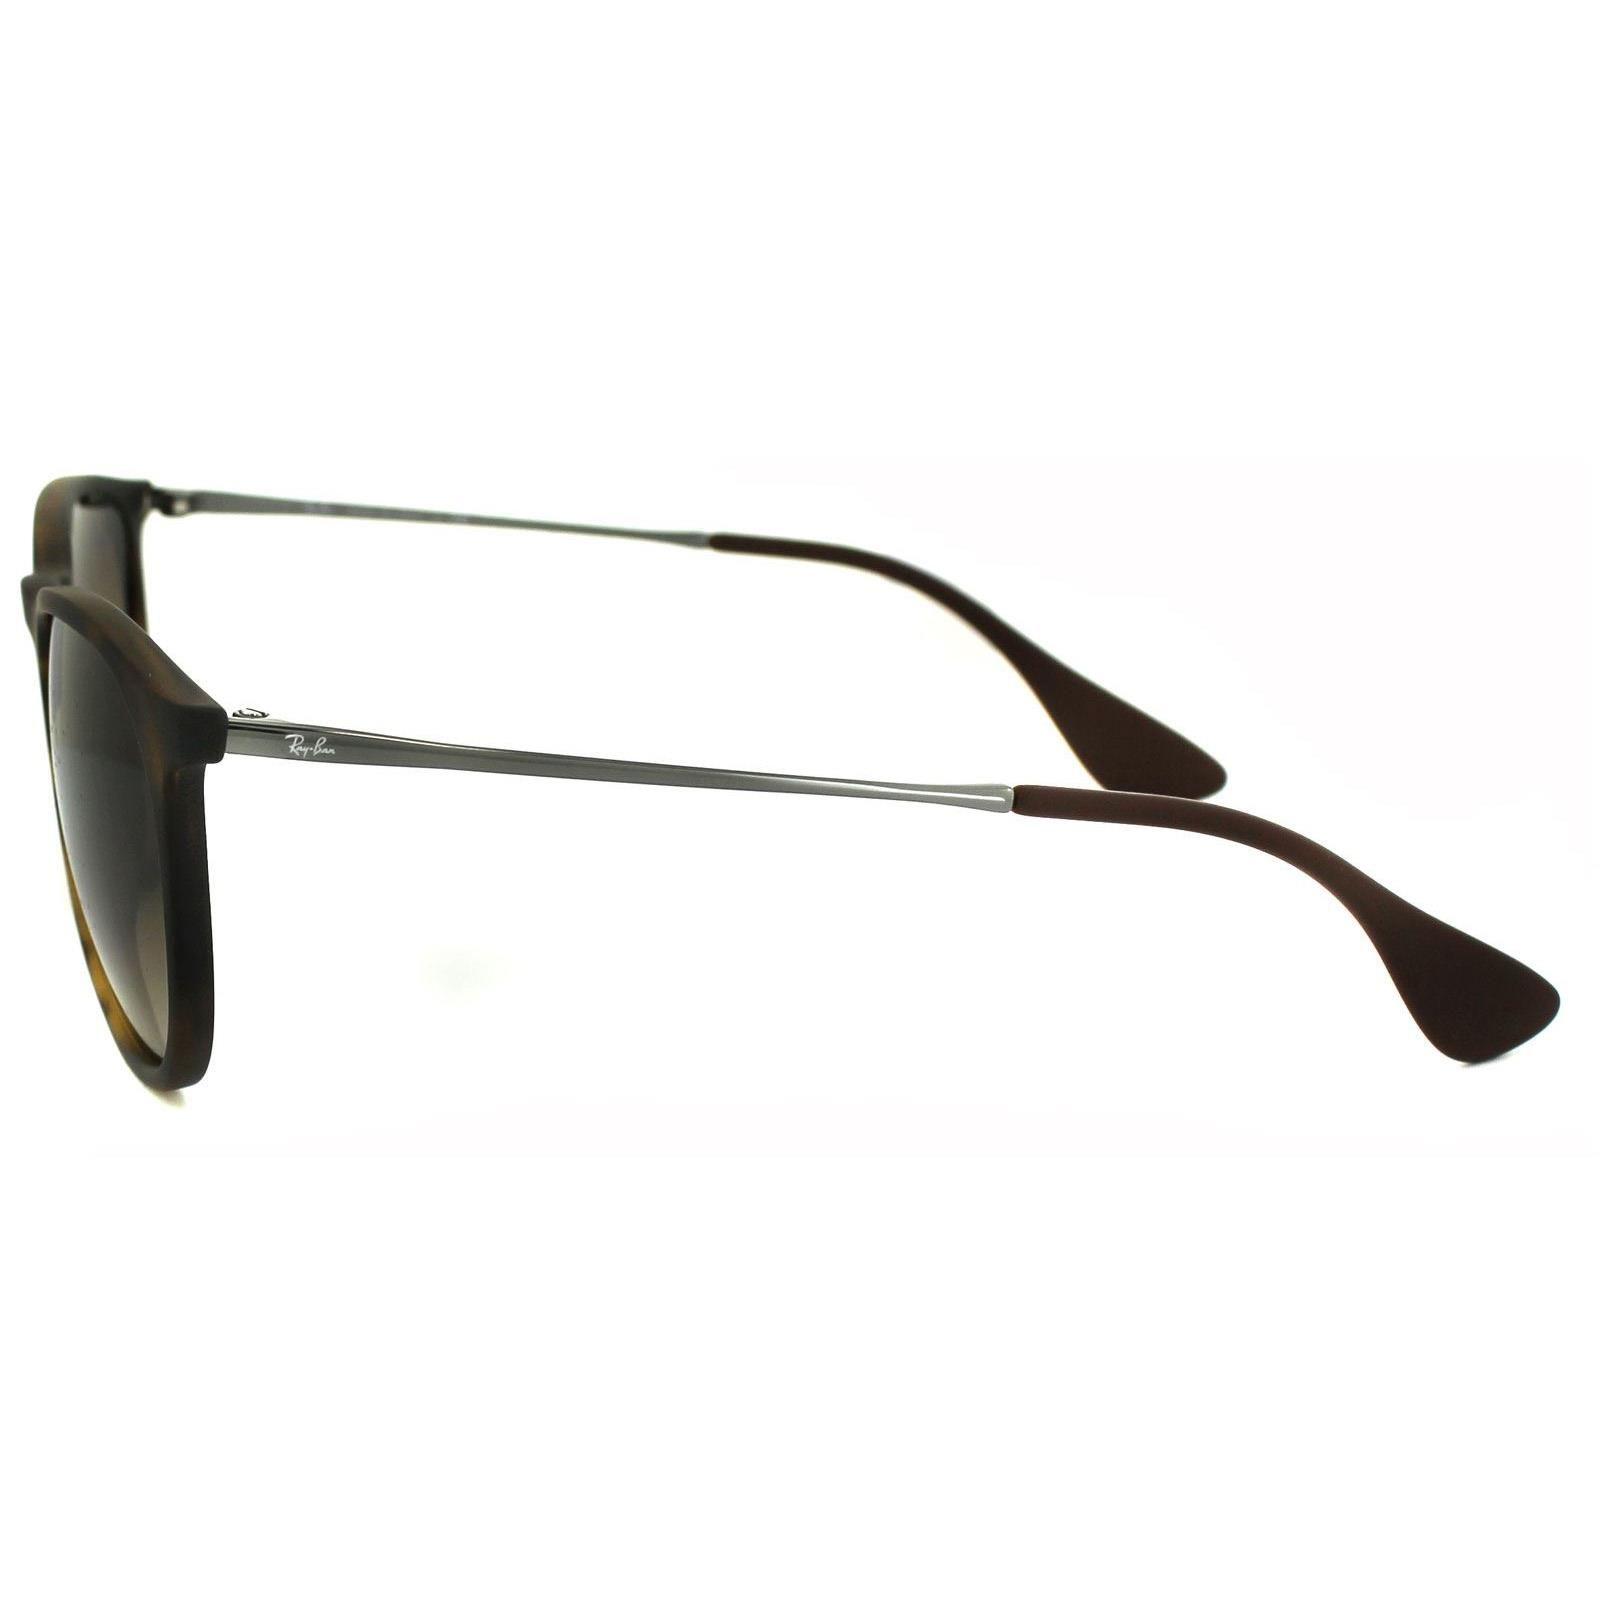 Ray-Ban Sunglasses Erika 4171 Rubberised Havana Brown Gradient 865/13